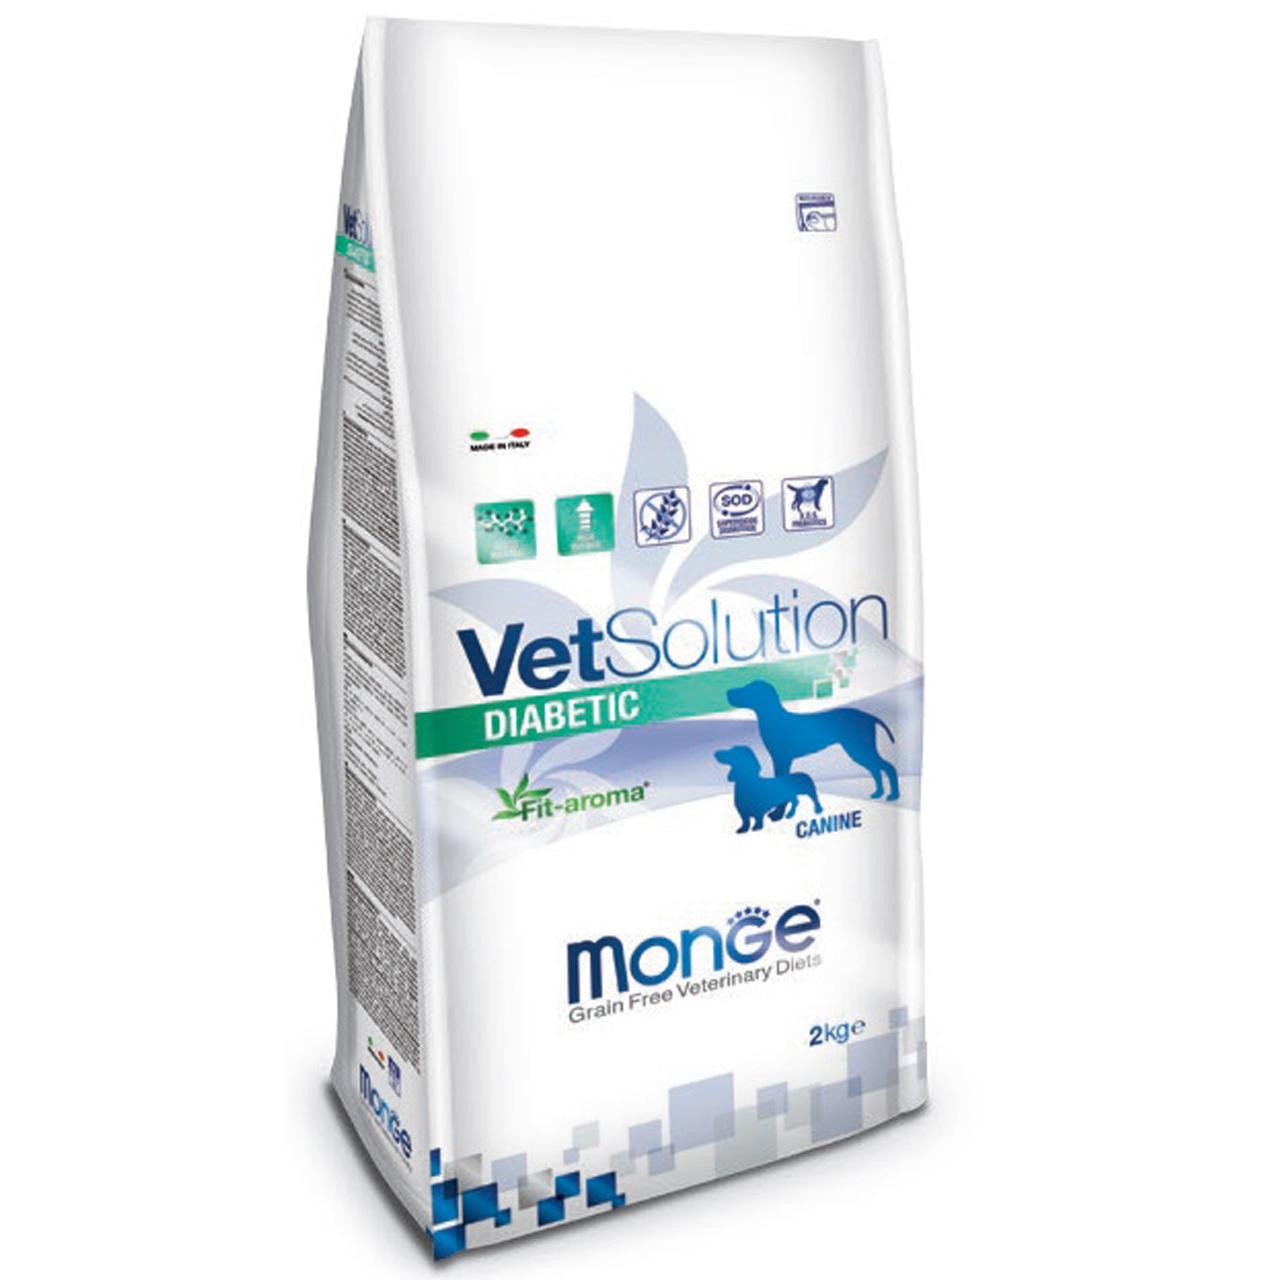 غذای خشک سگ مونگه مدل Diabetic-81276 وزن 2 کیلوگرم